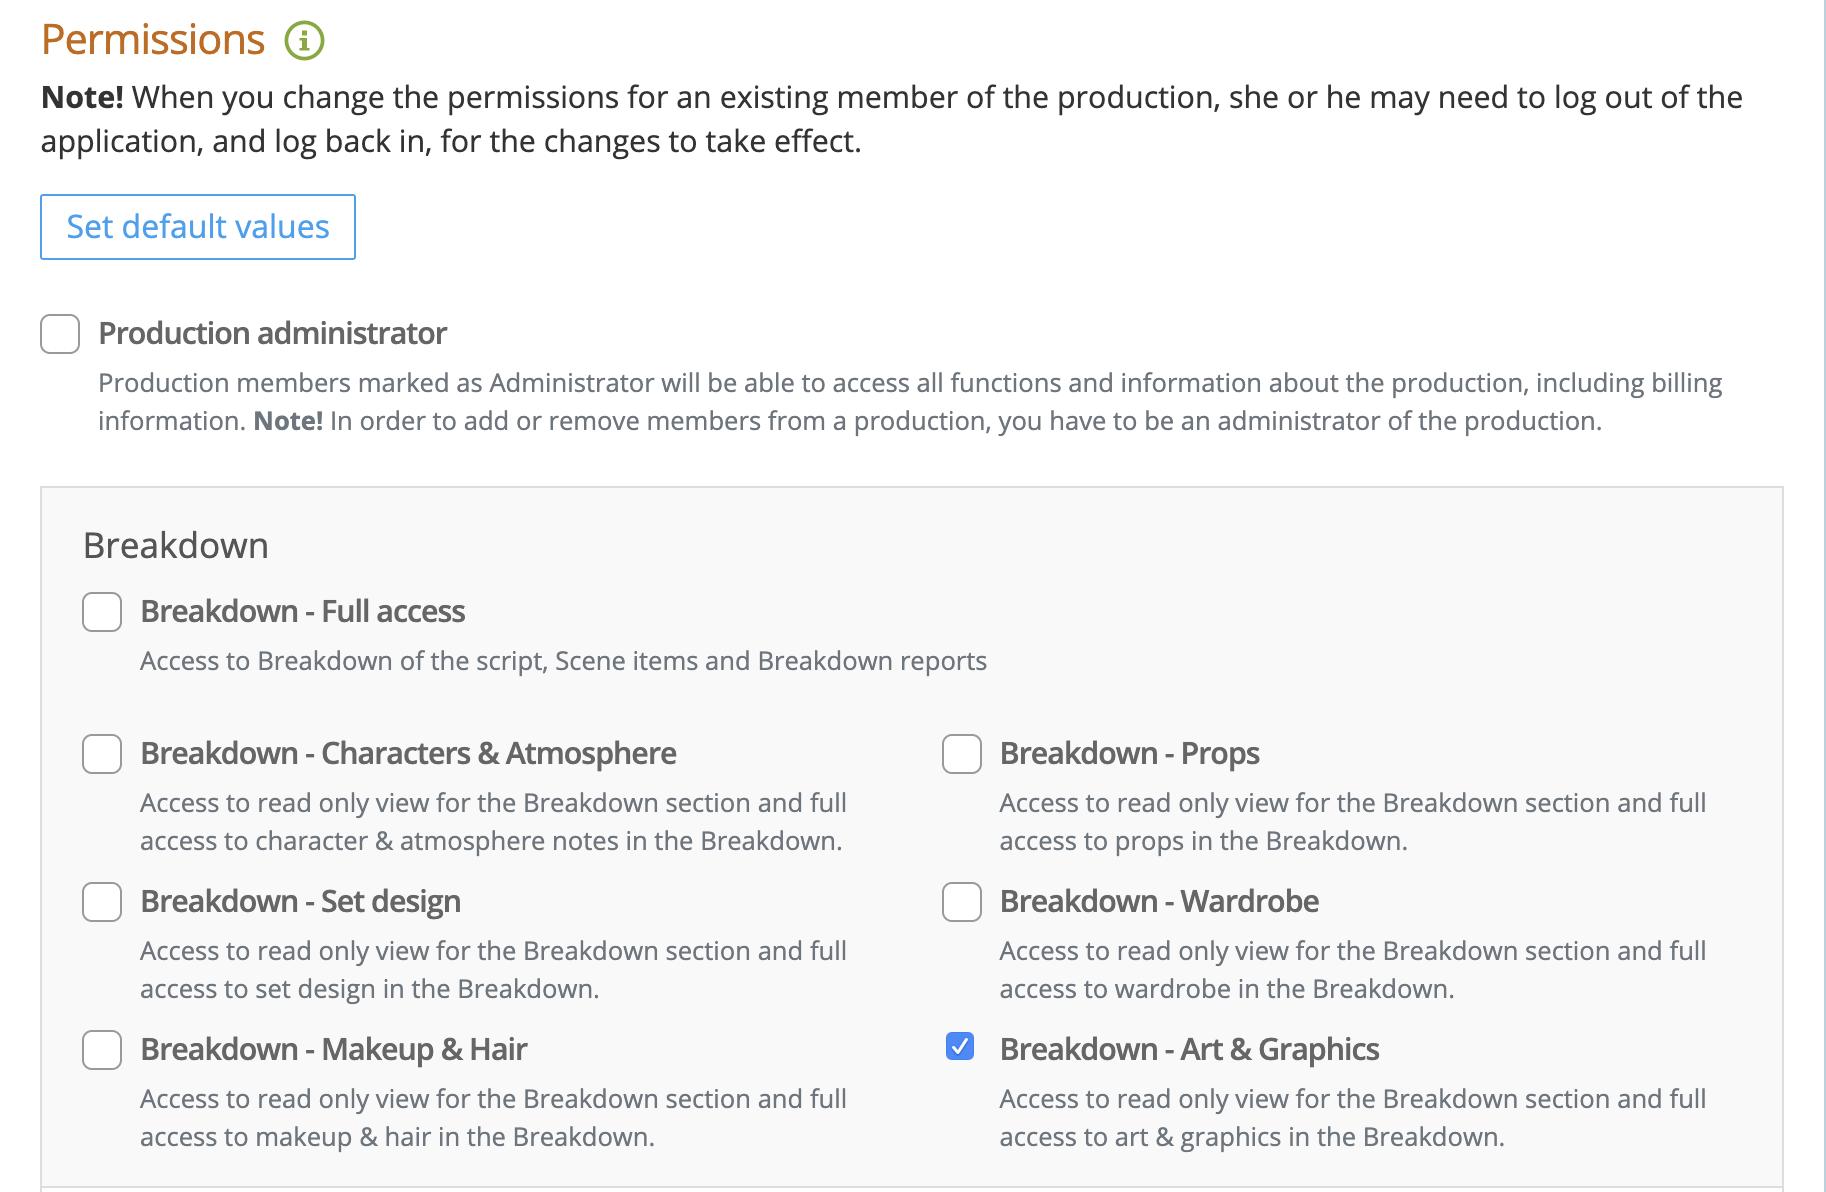 Adding Breakdown permissions